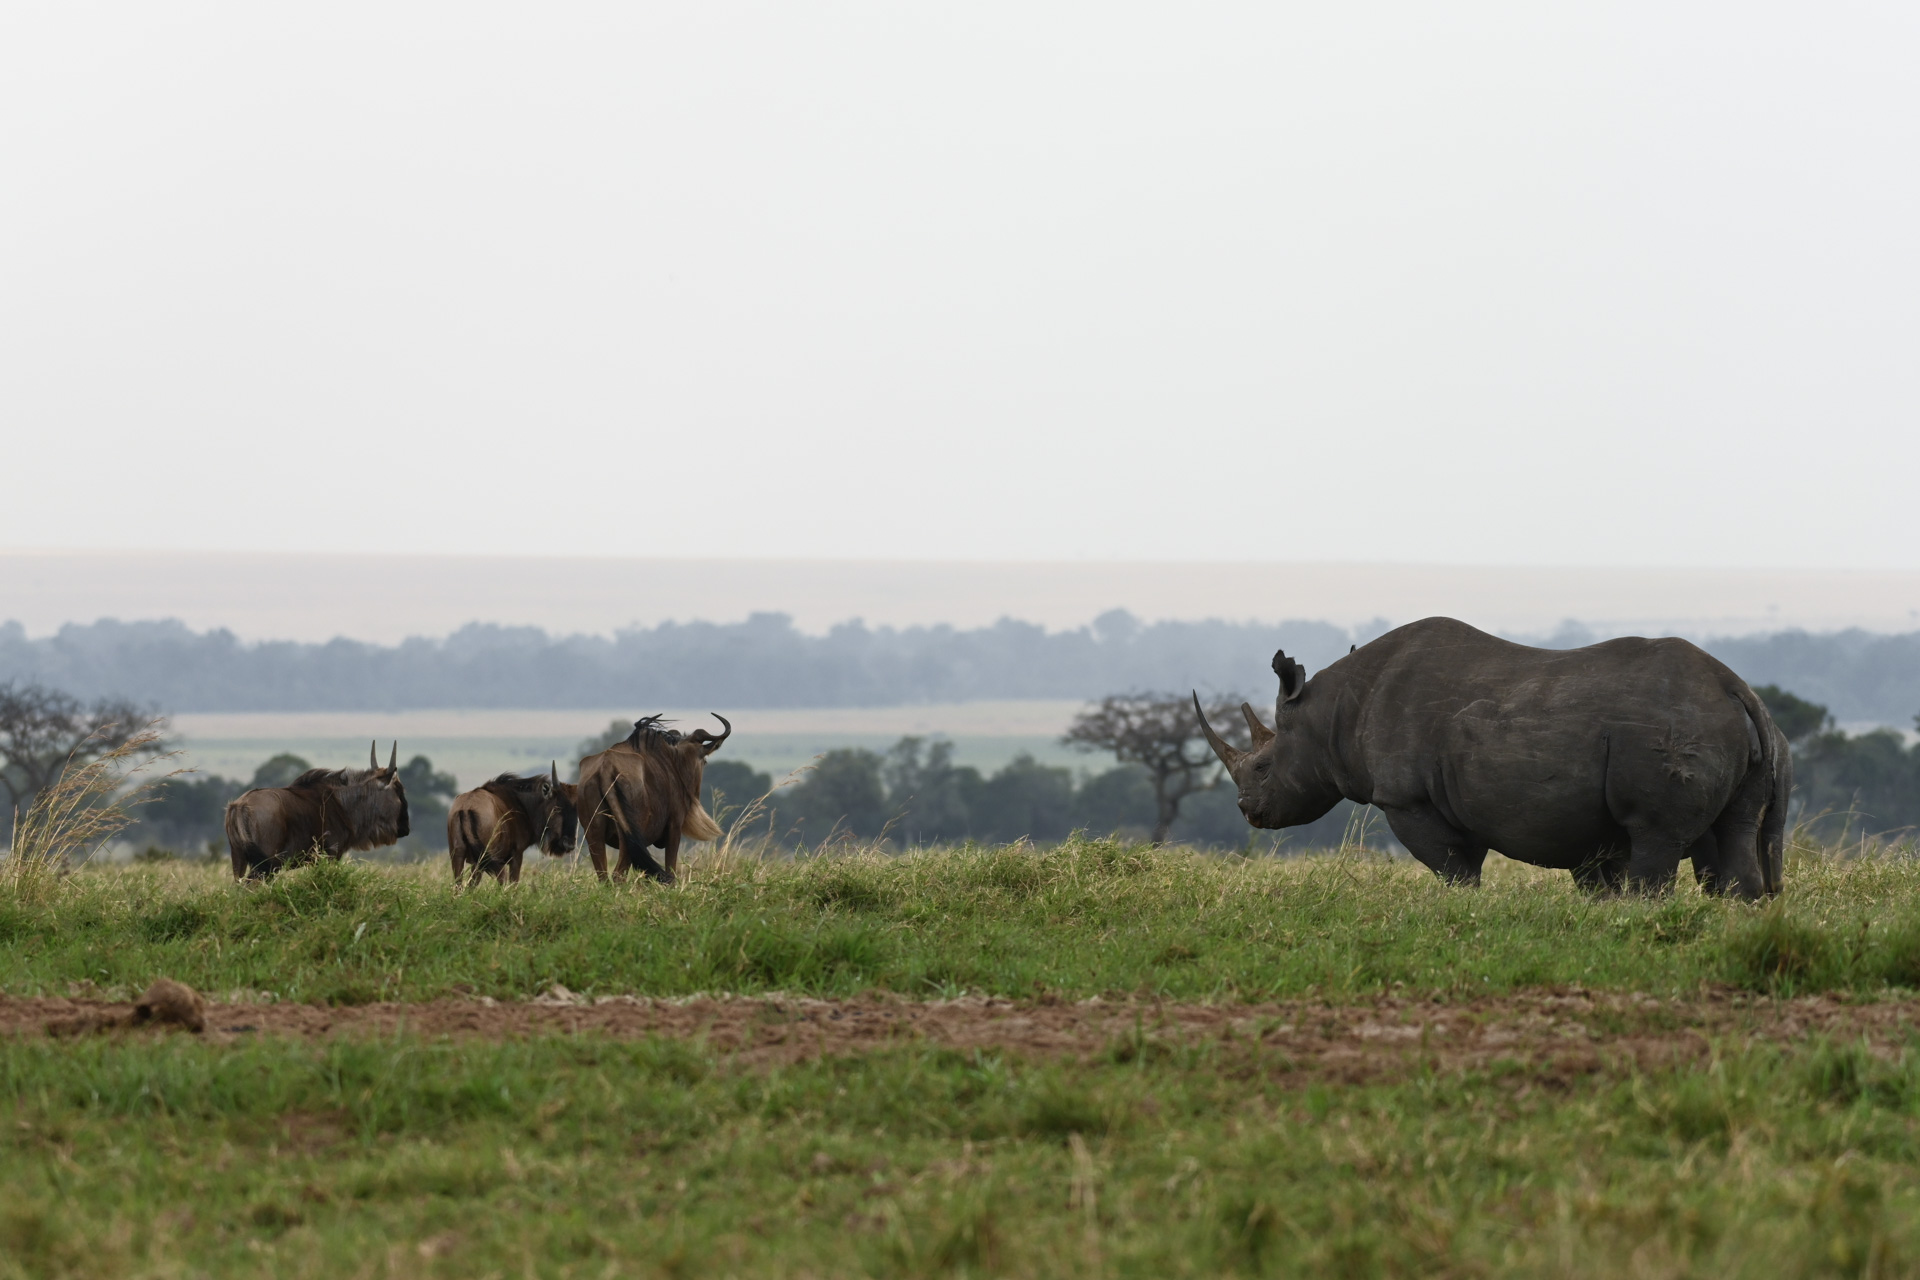 Rhino and wildebeest